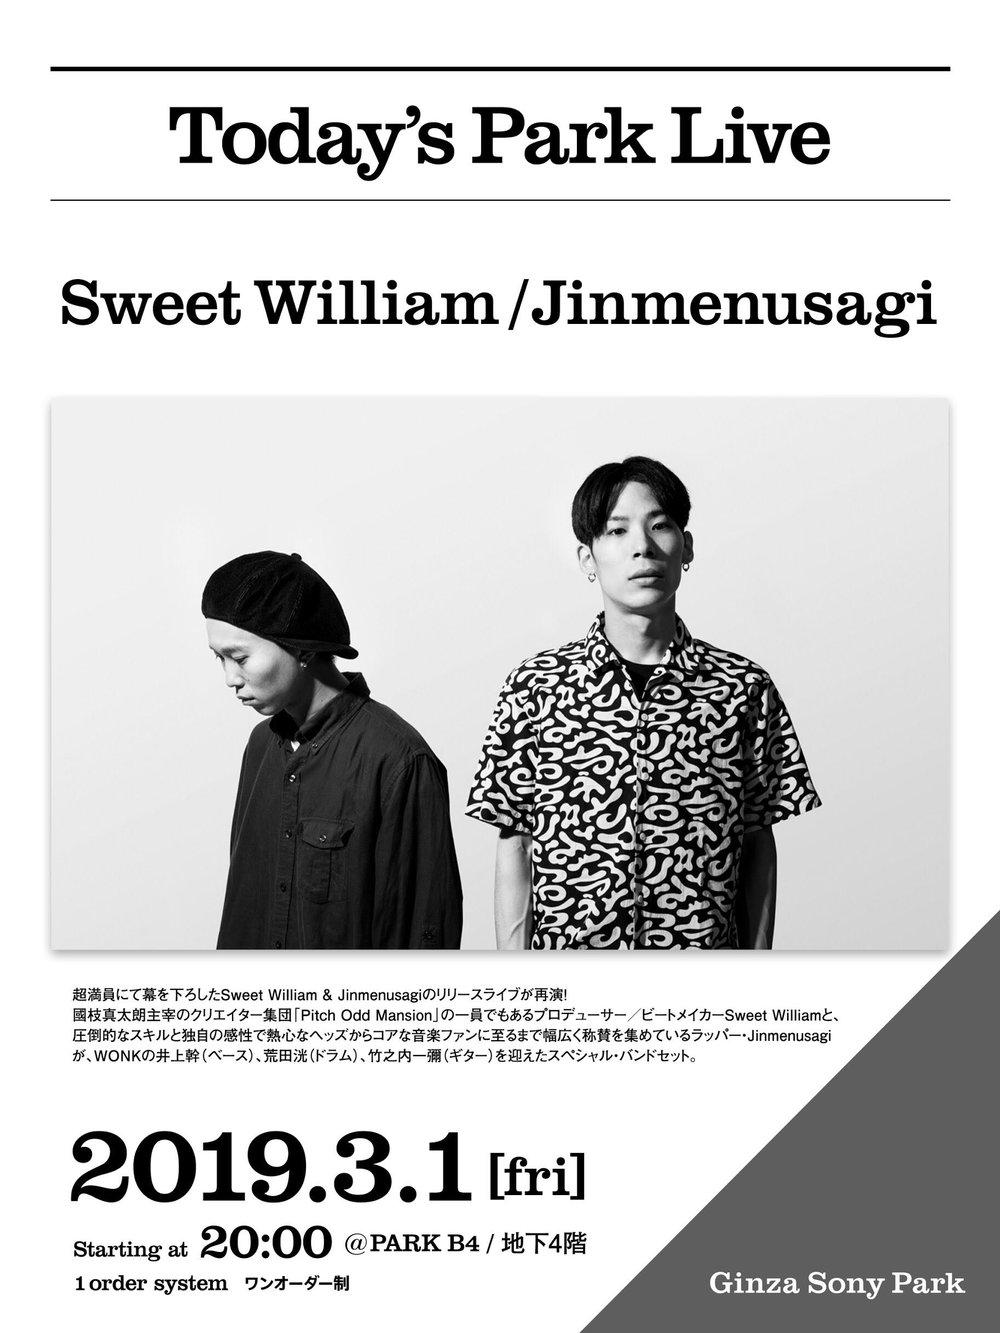 SweetWilliam_Jinmenusagi_3.1_flyer.jpg